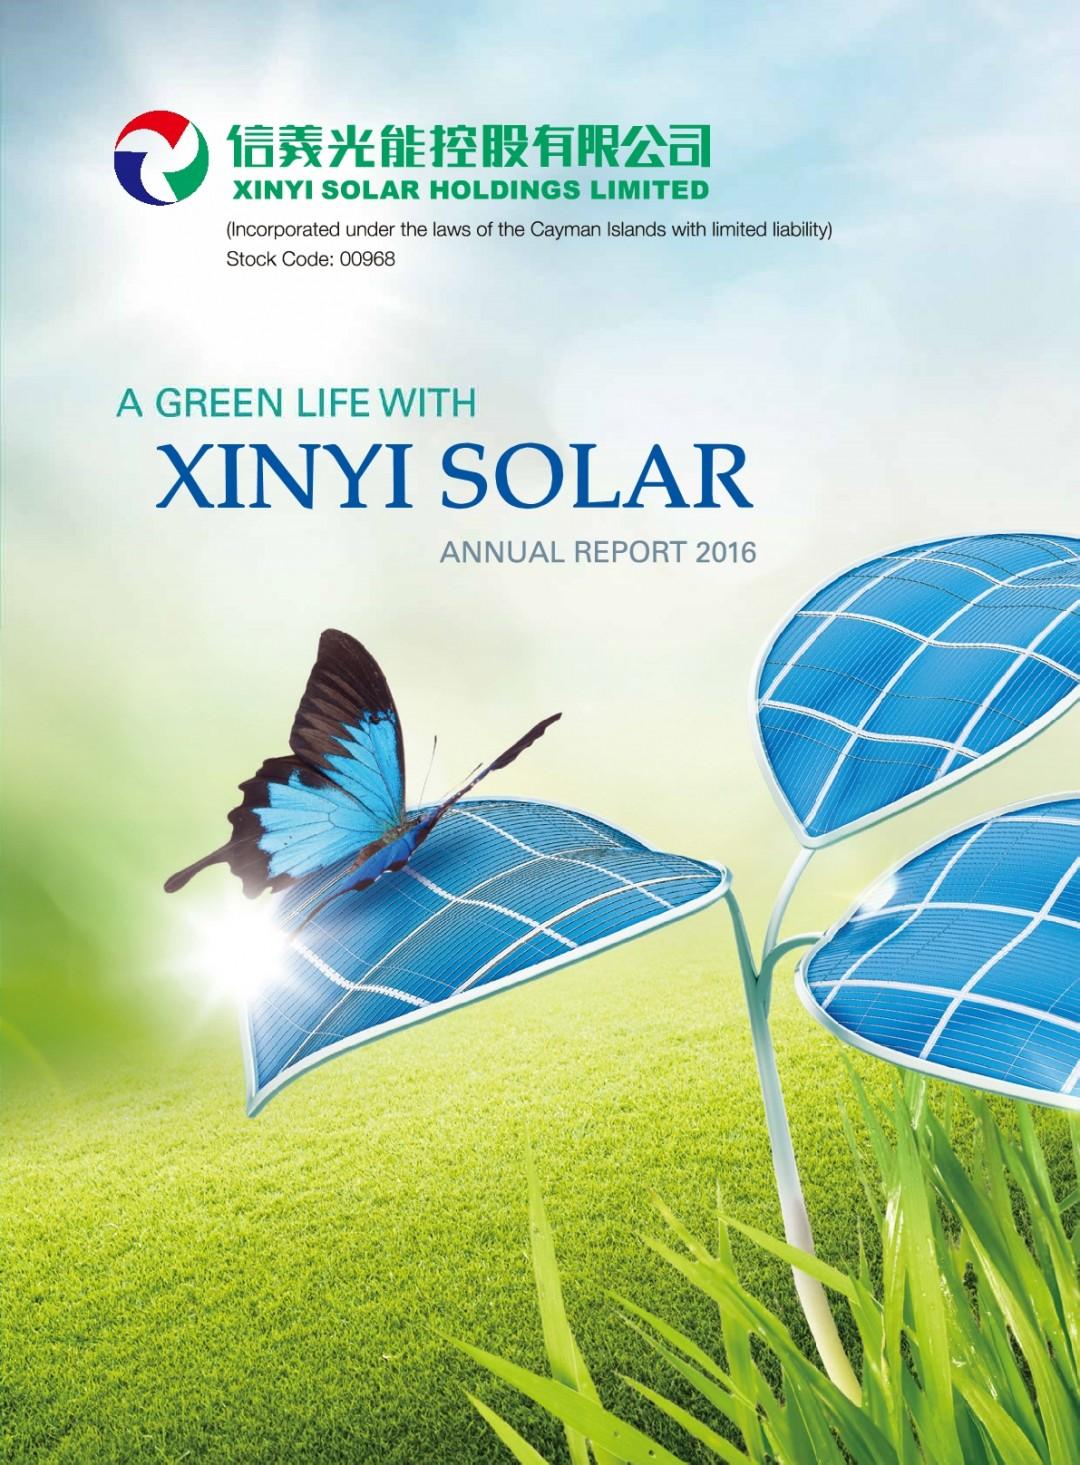 Xinyi Solar Holdings Limted